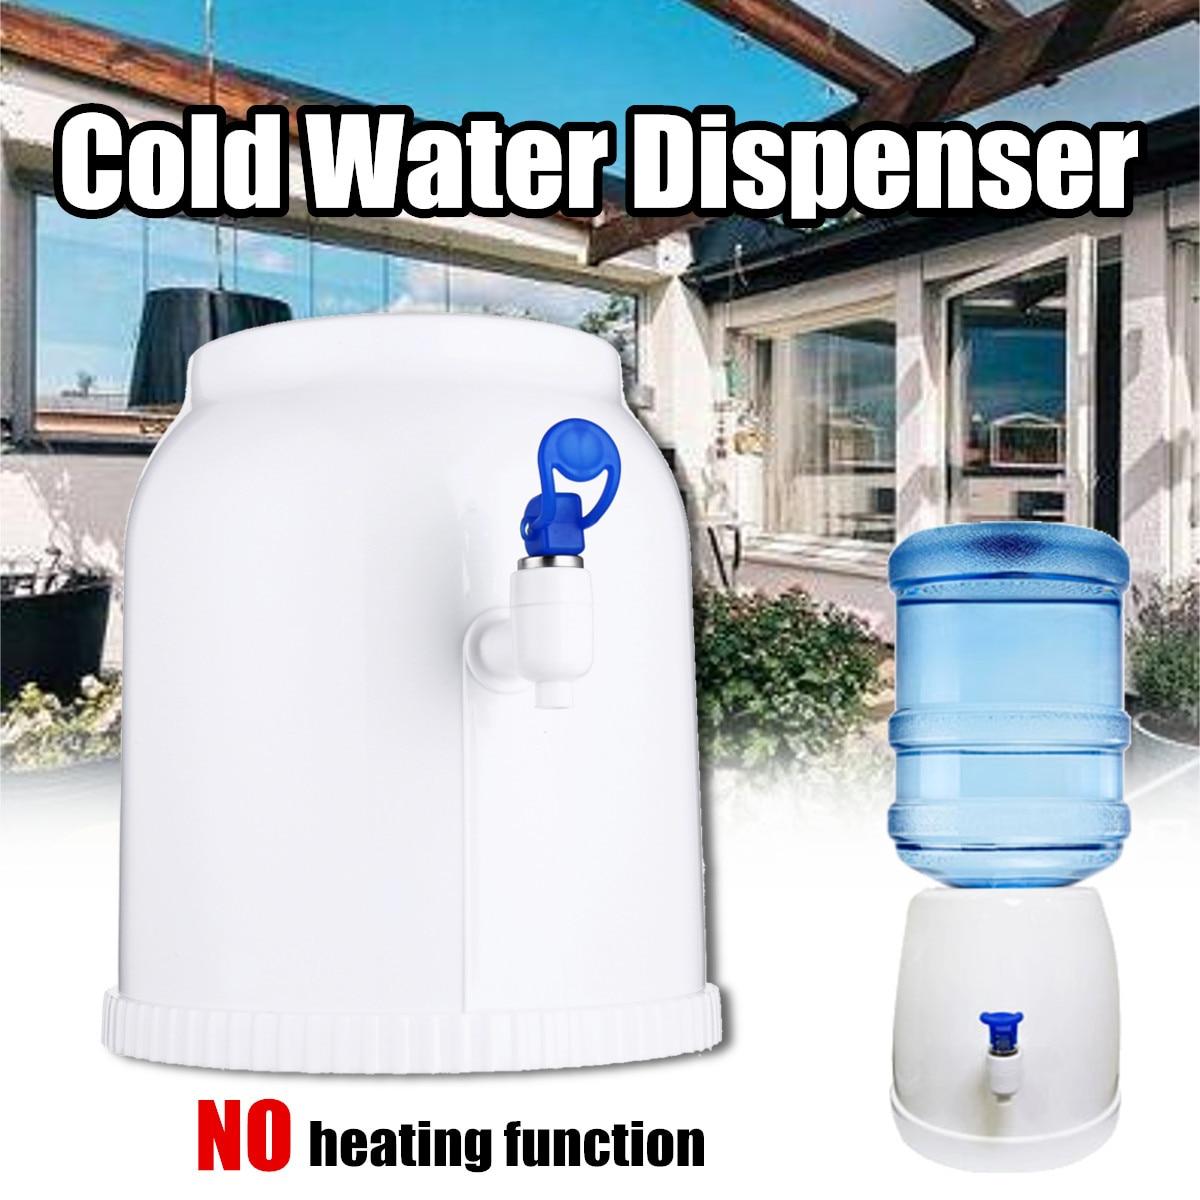 Desktop Cold Water Dispenser Gallon Drinking Bottle Portable Countertop Cooler Drinking Faucet Tool Press Water Pumping Device